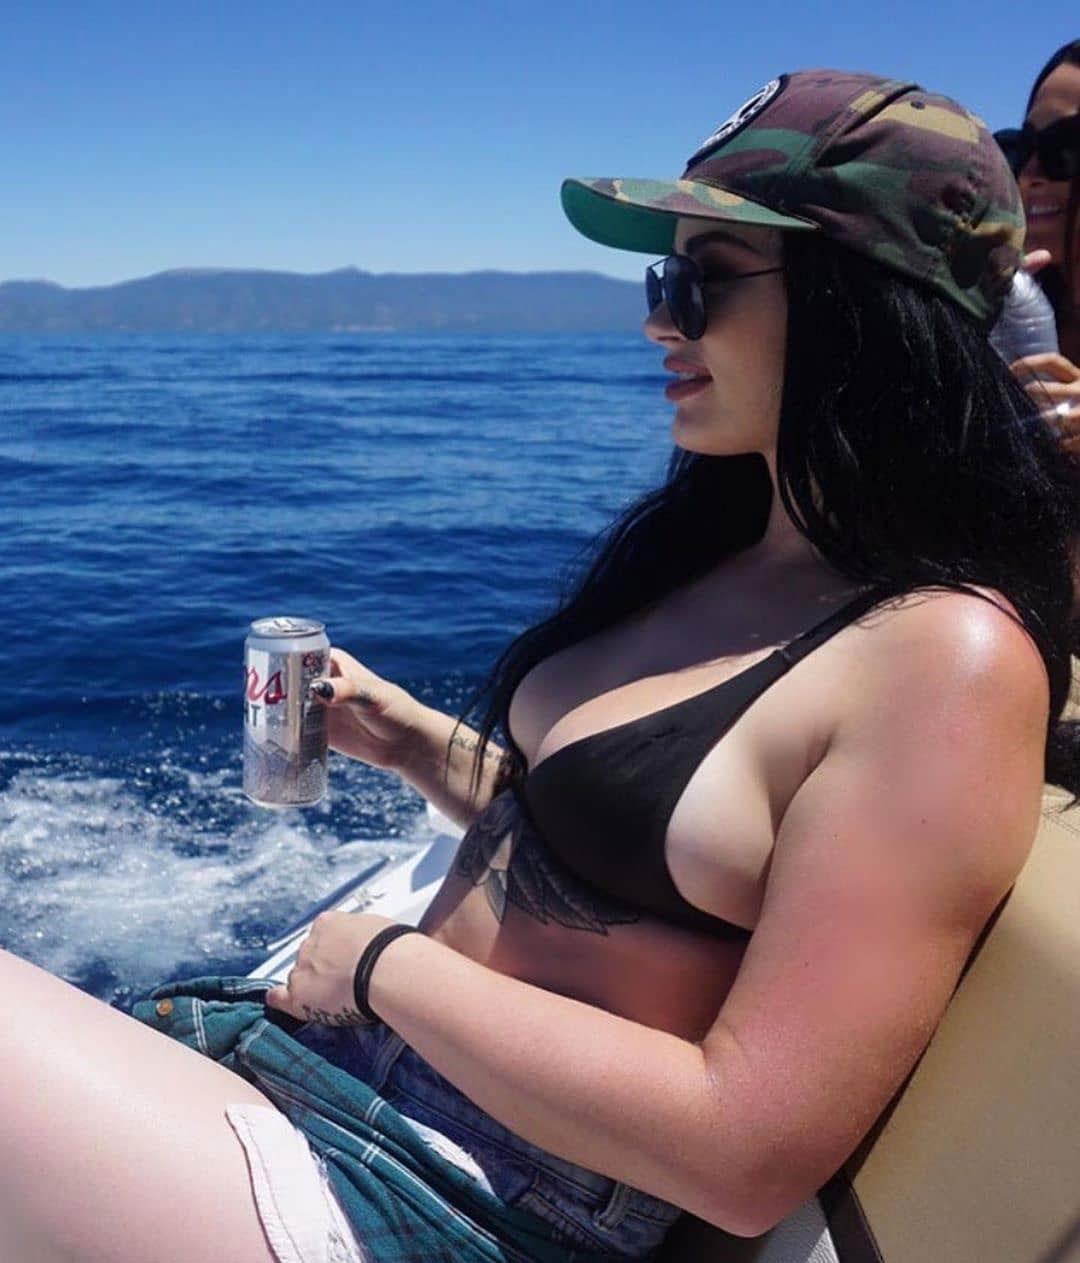 WWE Diva Paige on Holiday